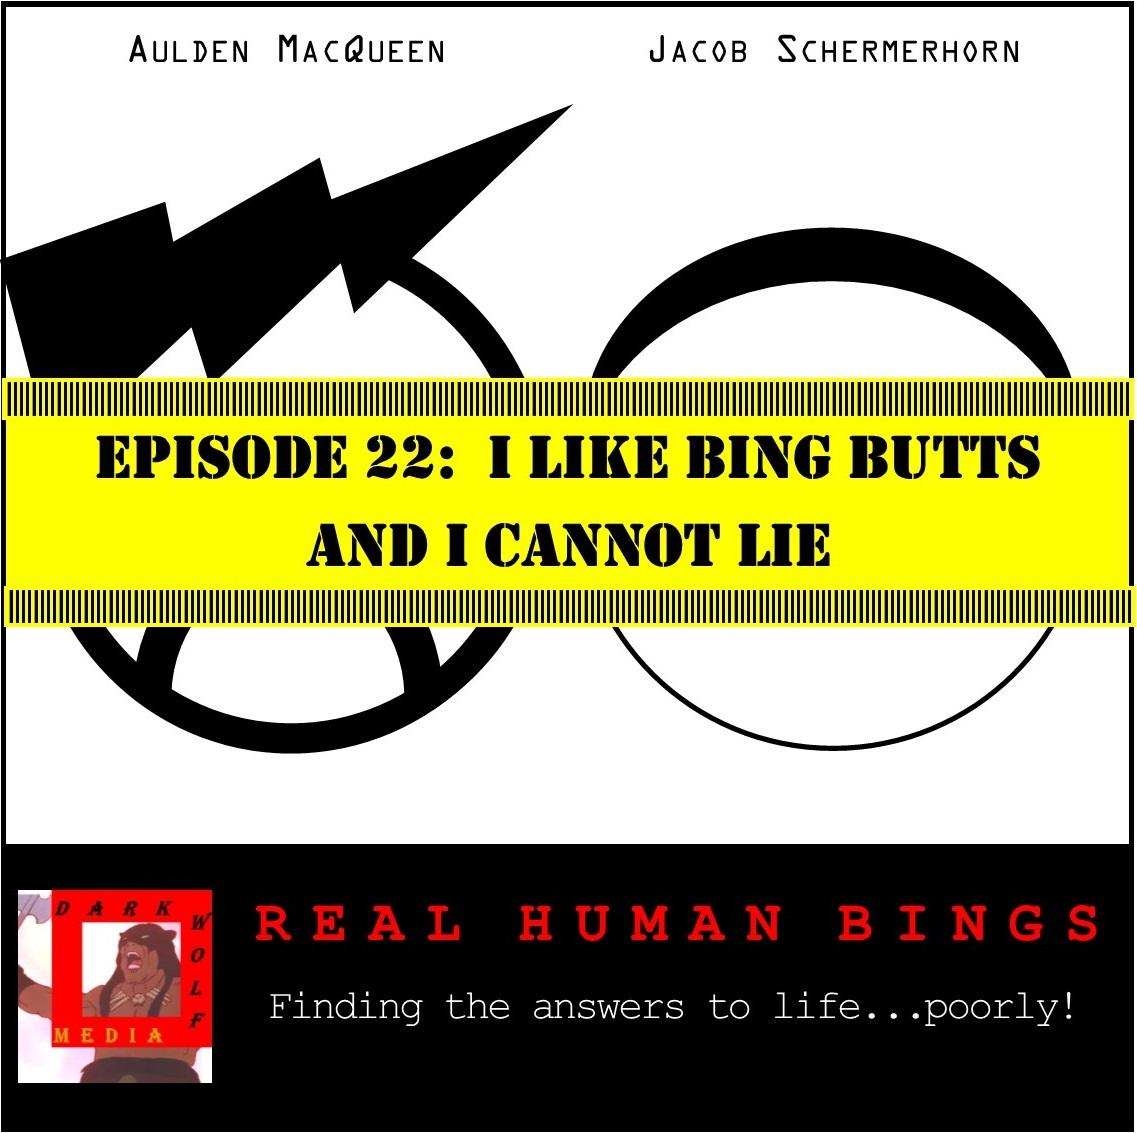 Episode 22 Cover.jpg